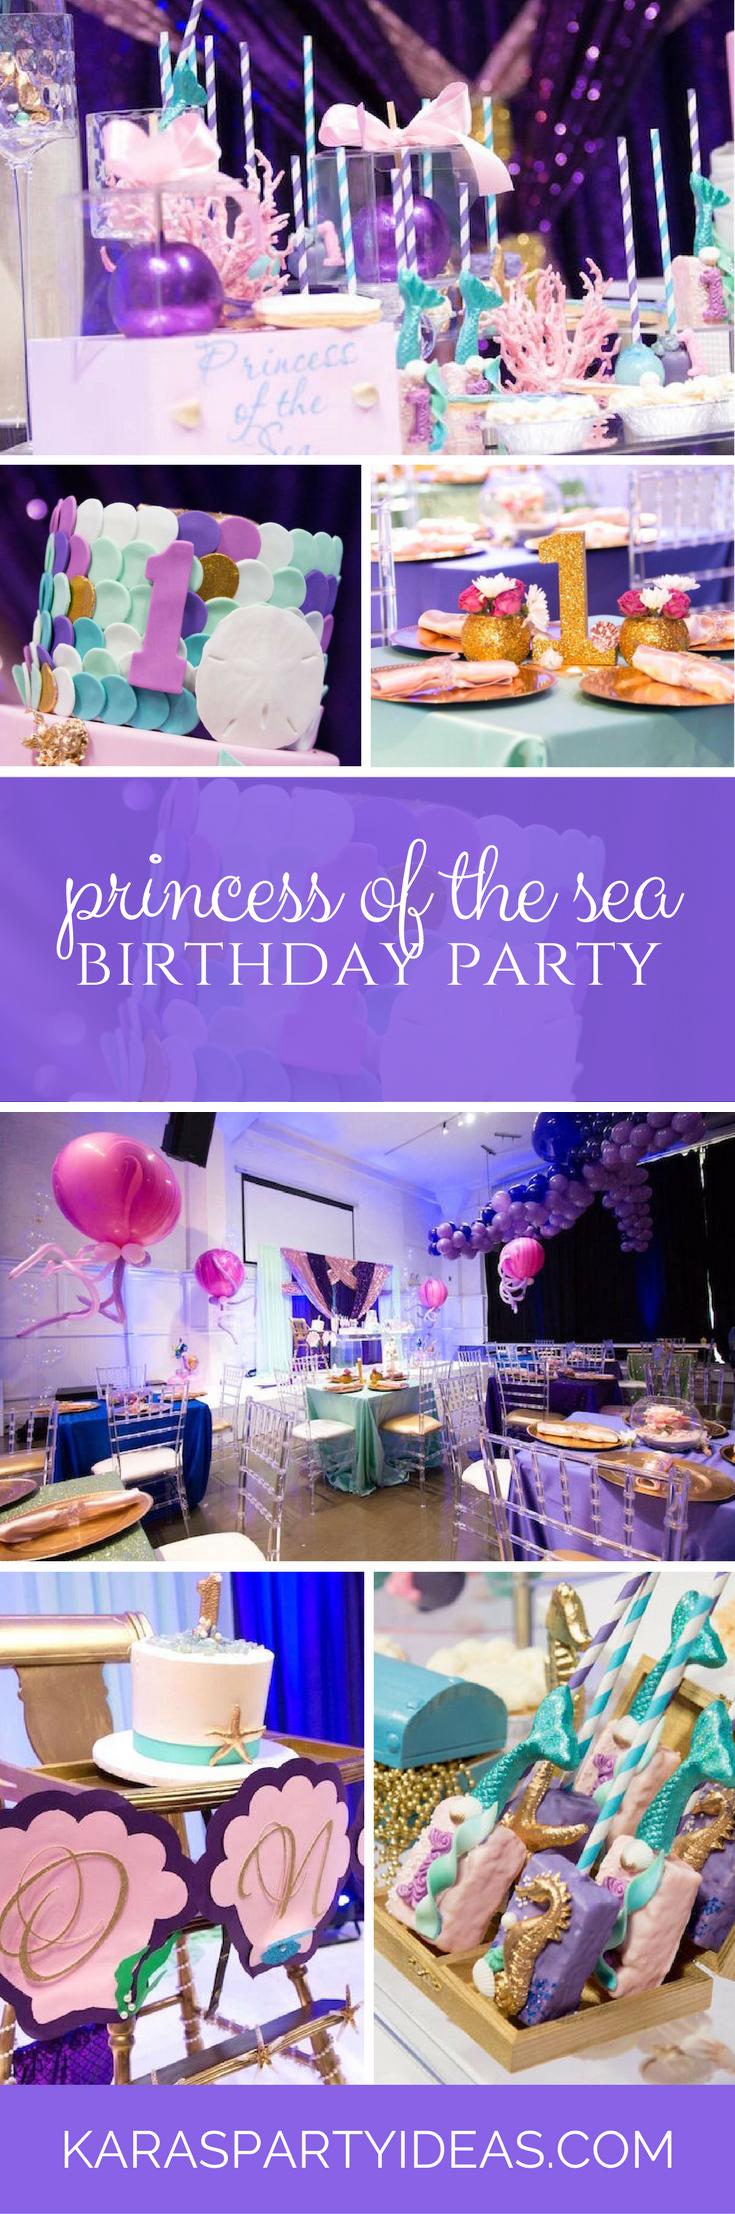 Princess of the Sea Birthday Party via Kara's Party Ideas - KarasPartyIdeas.com